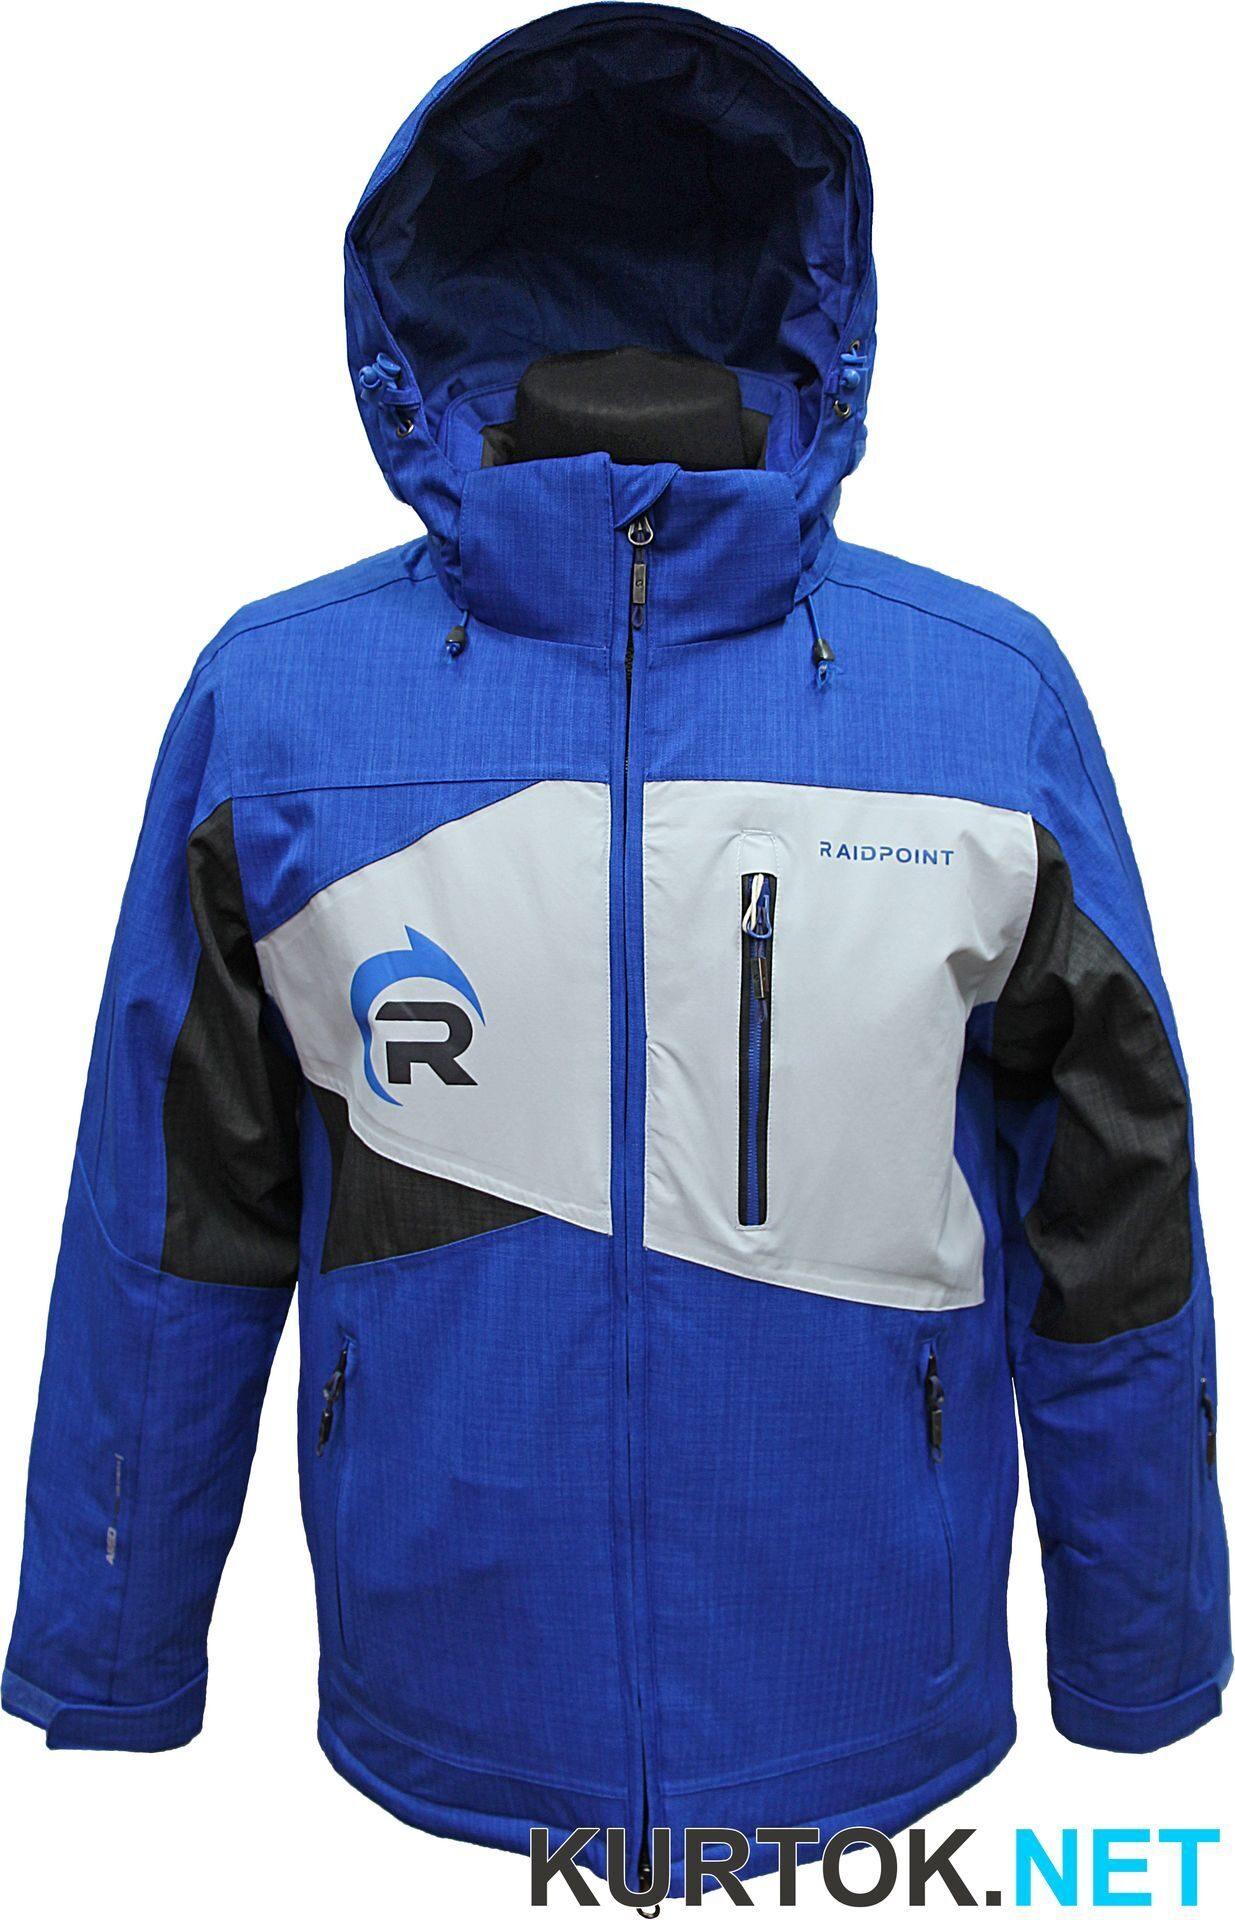 Куртка горнолыжная мужская (синяя) Мембранная одежда Raidpoint ... e8592e556d1